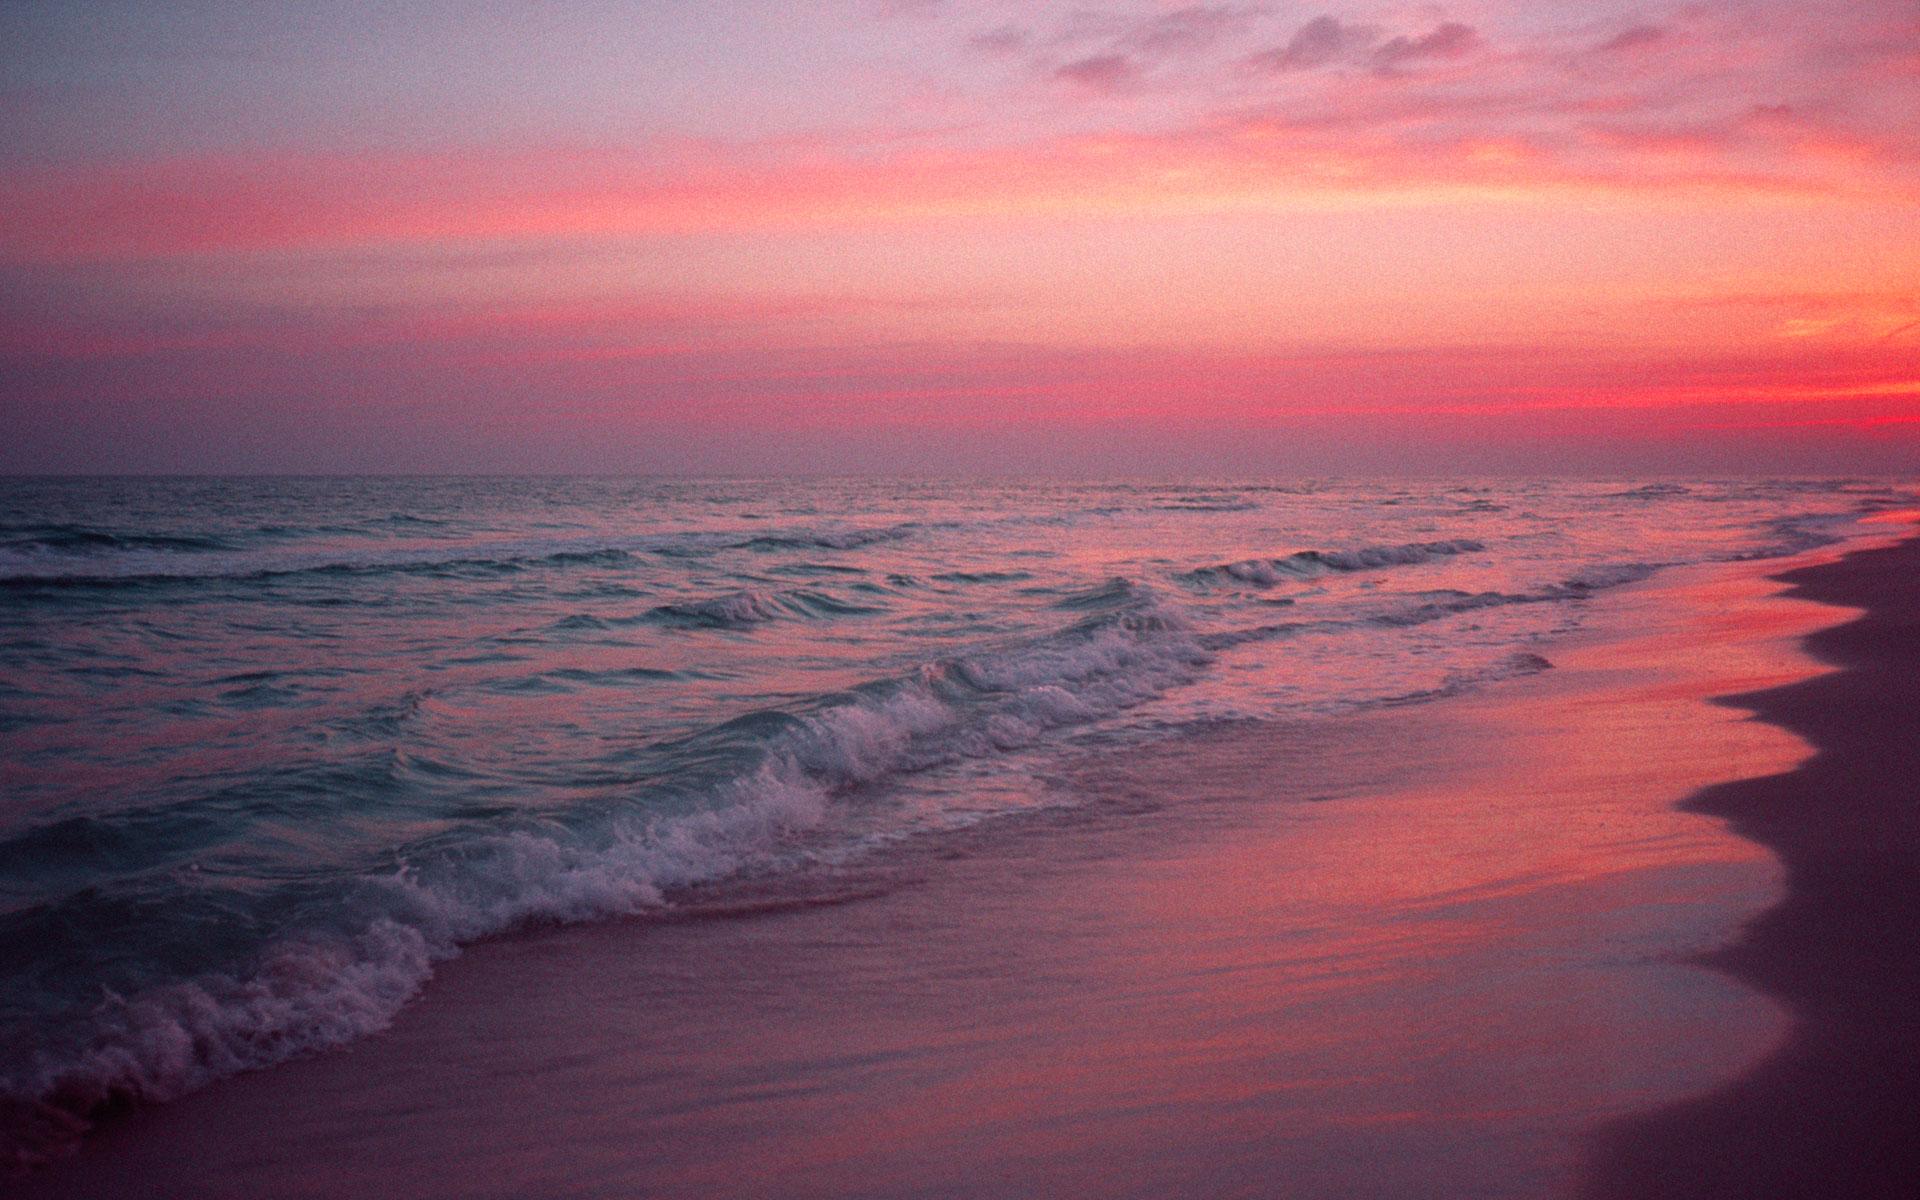 Seaside Sunset Pictures Scenic Desktop wallpaper 1920x1200